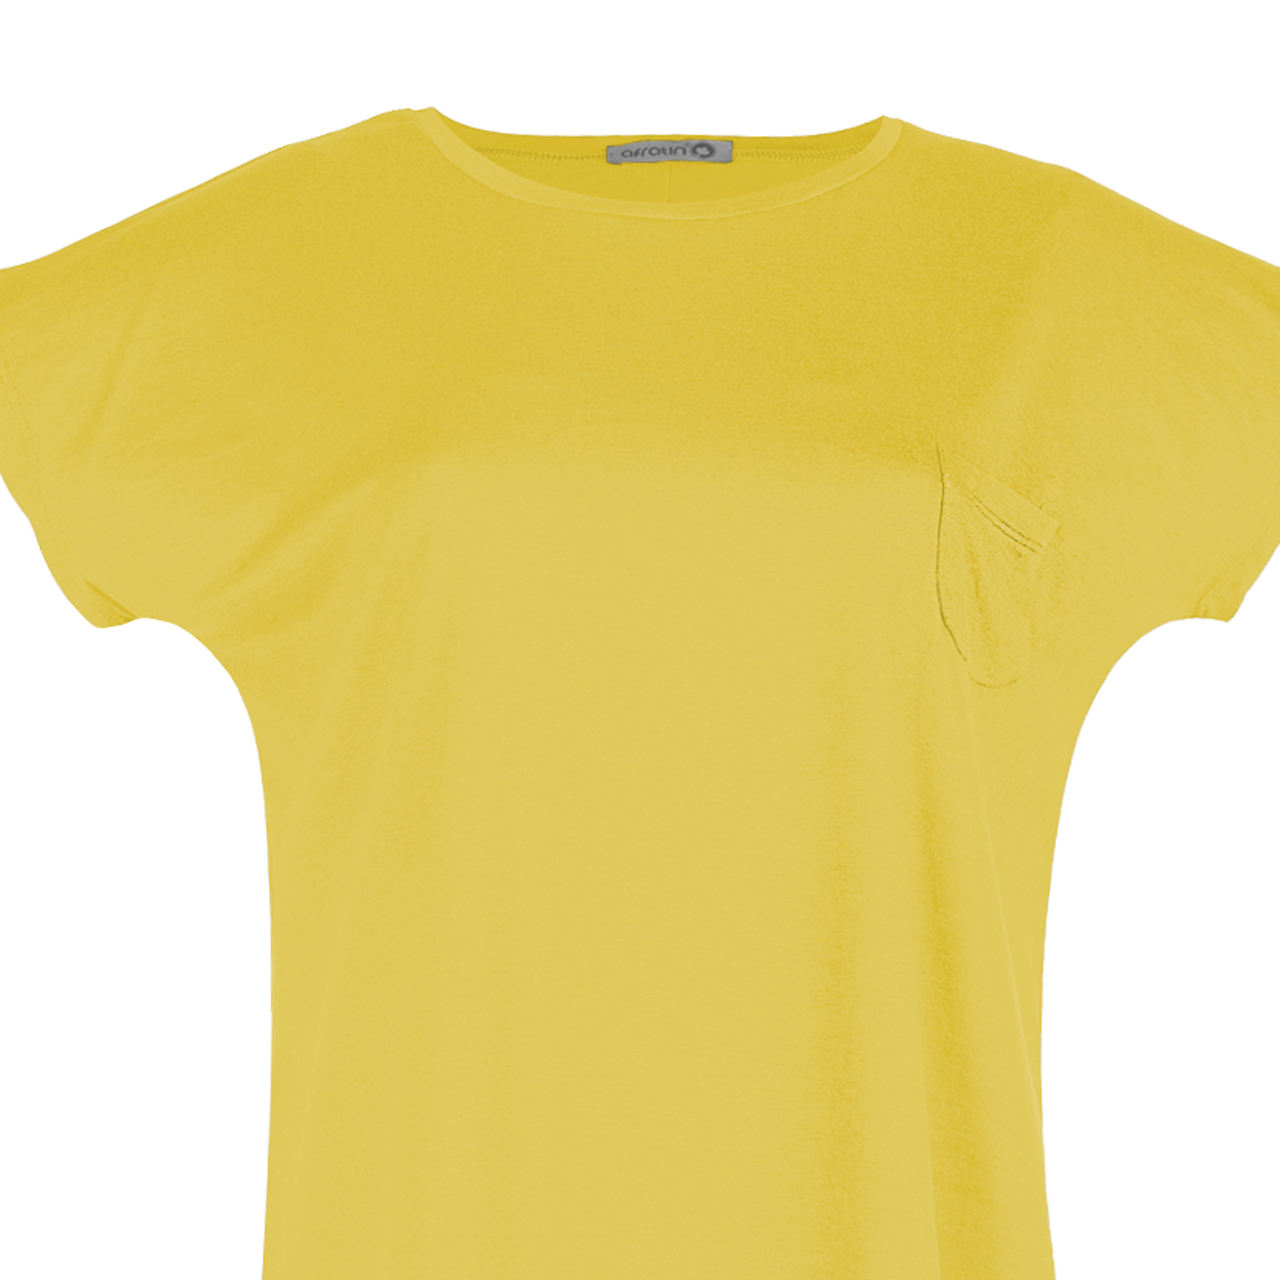 تی شرت زنانه افراتین کد 2517 رنگ زرد -  - 4